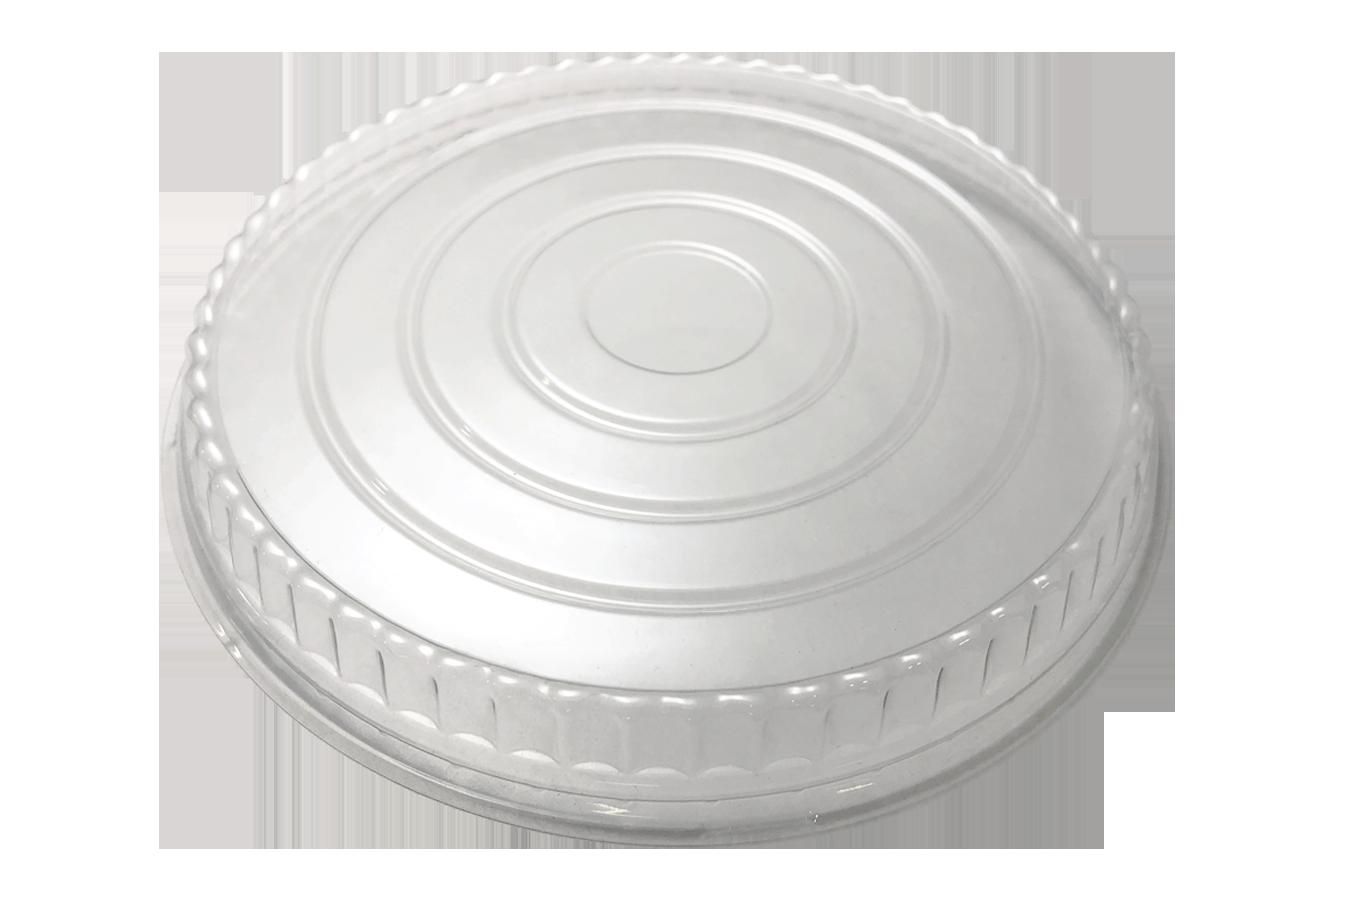 Line art illustration of clear transparent plastic non-vented lid for Ecopax 48 oz Athena paper bowl